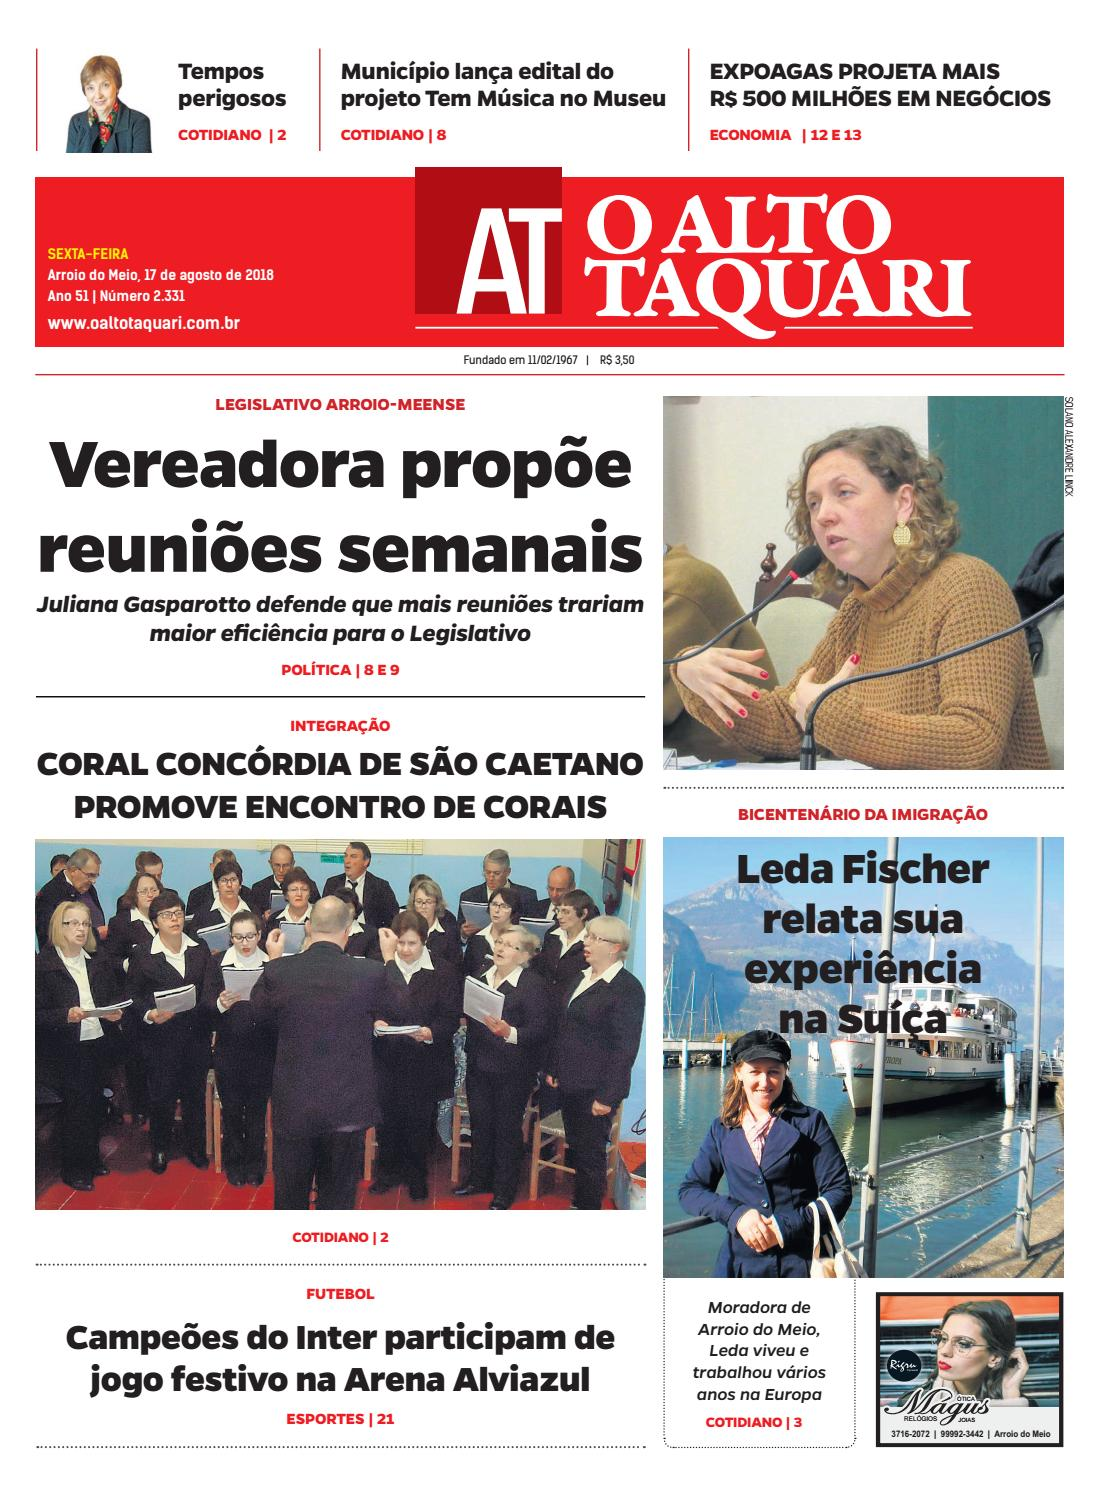 dcca02a9371 Jornal O Alto Taquari - 17 de agosto de 2018 by Jornal O Alto Taquari -  issuu